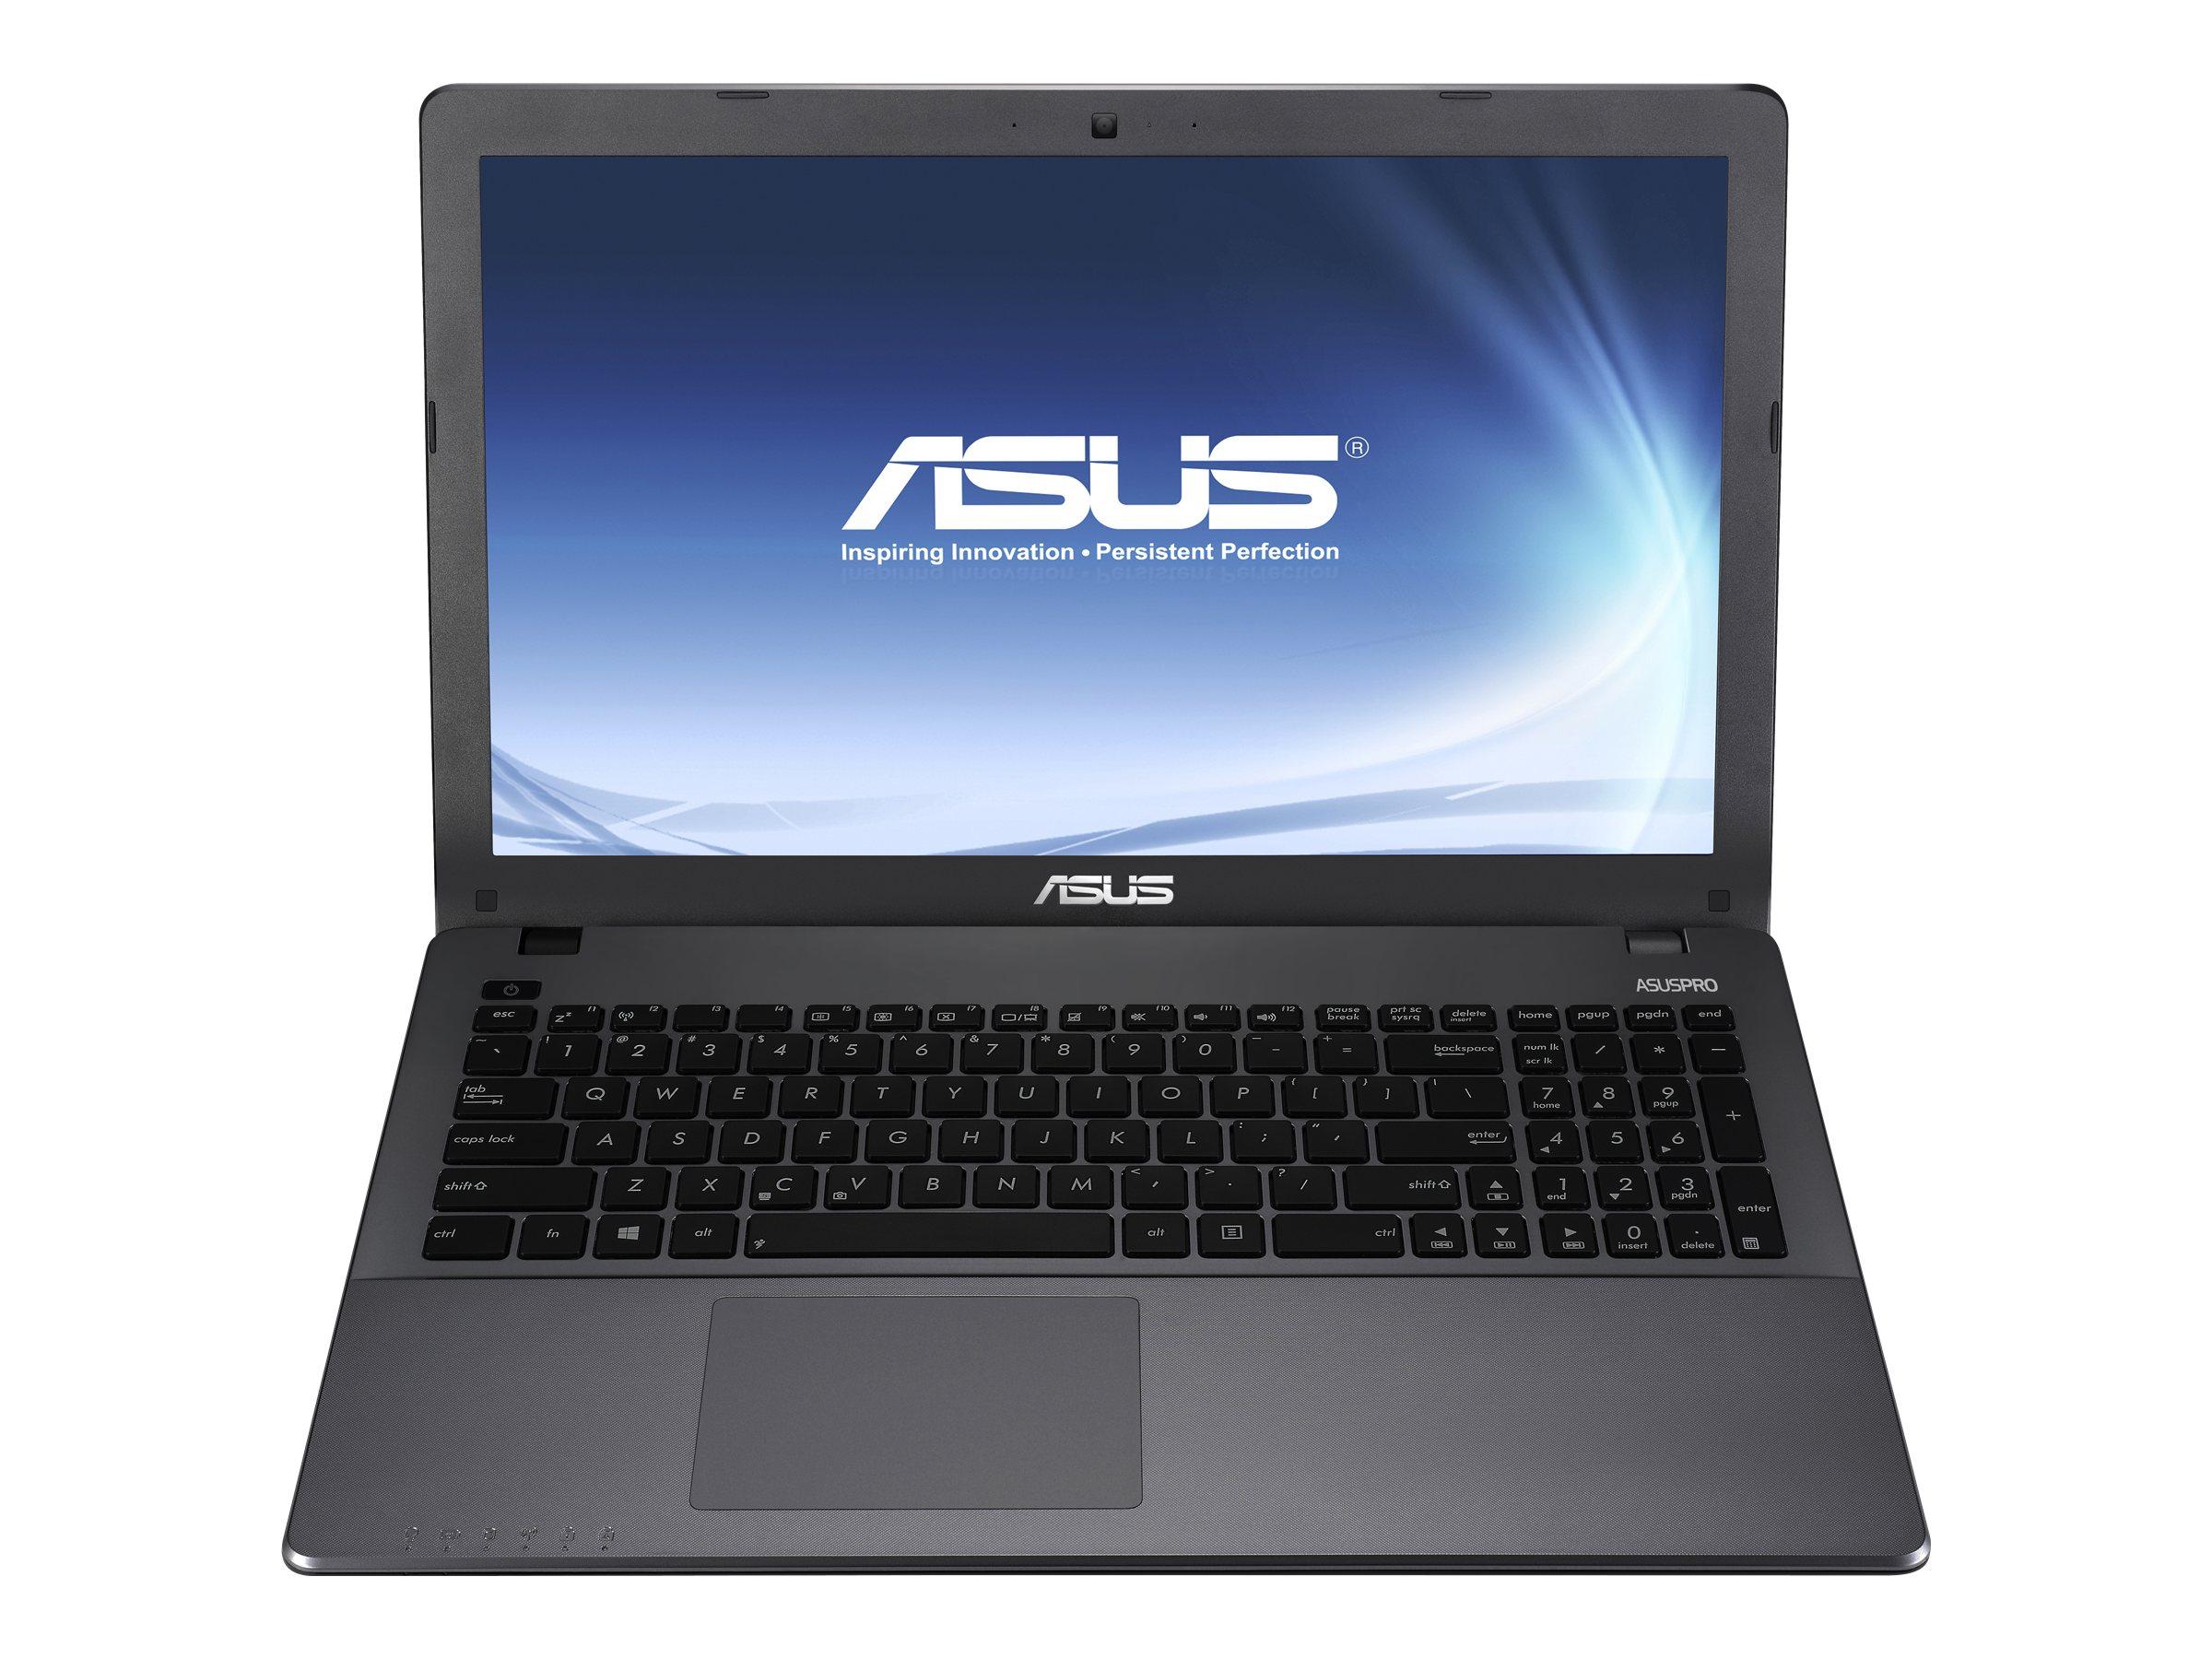 Asus X550LA Core i7 1.8GHz 8GB 750GB 15.6 W8P-W7P64, P550LA-XS71, 16994732, Notebooks